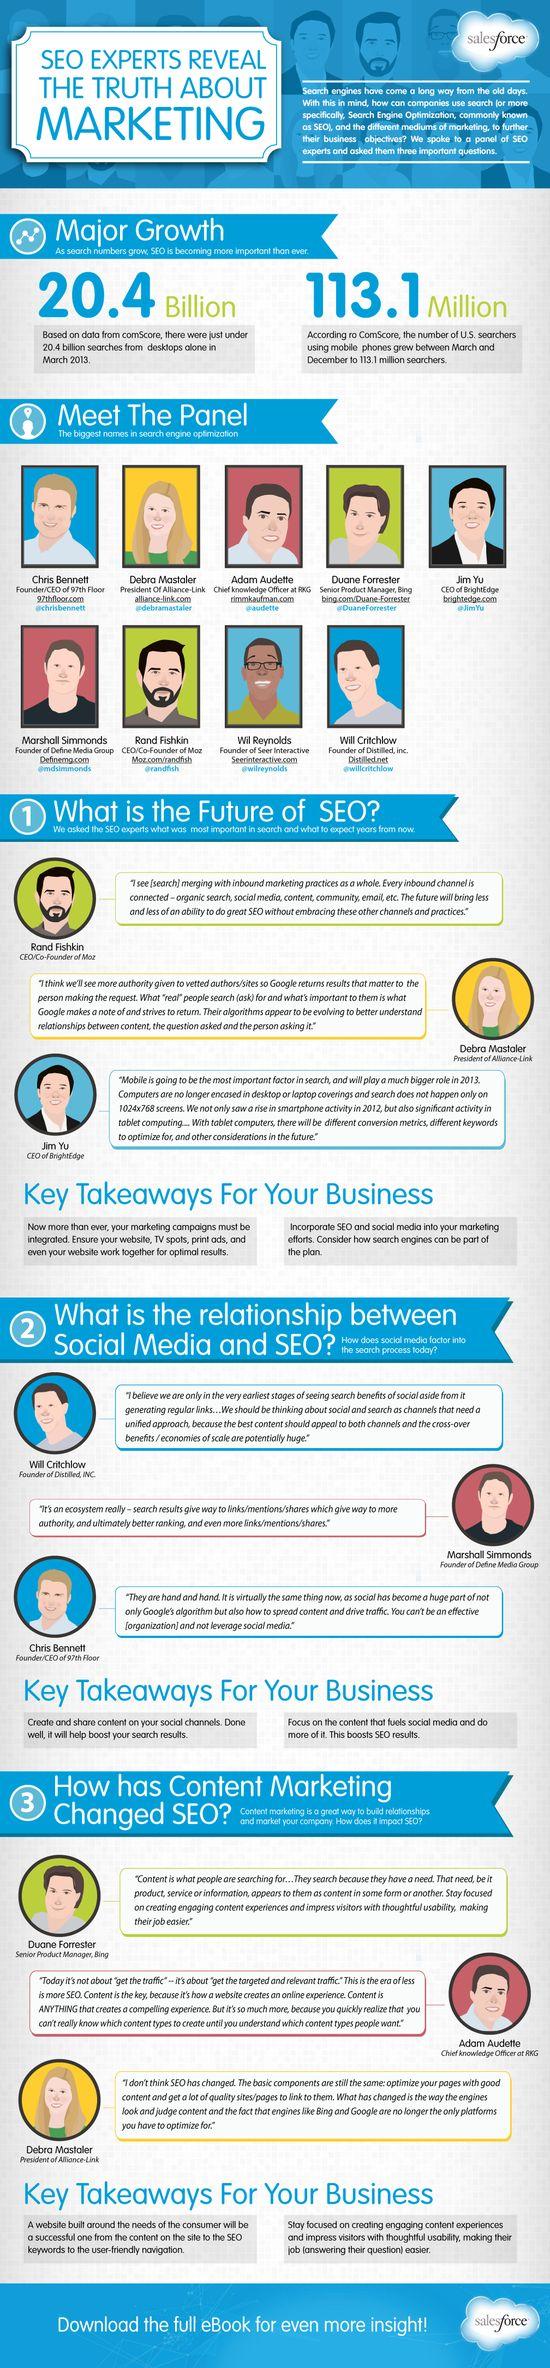 Expertos SEO nos cuentan la verdad sobre el marketing #infografia #infographic #seo